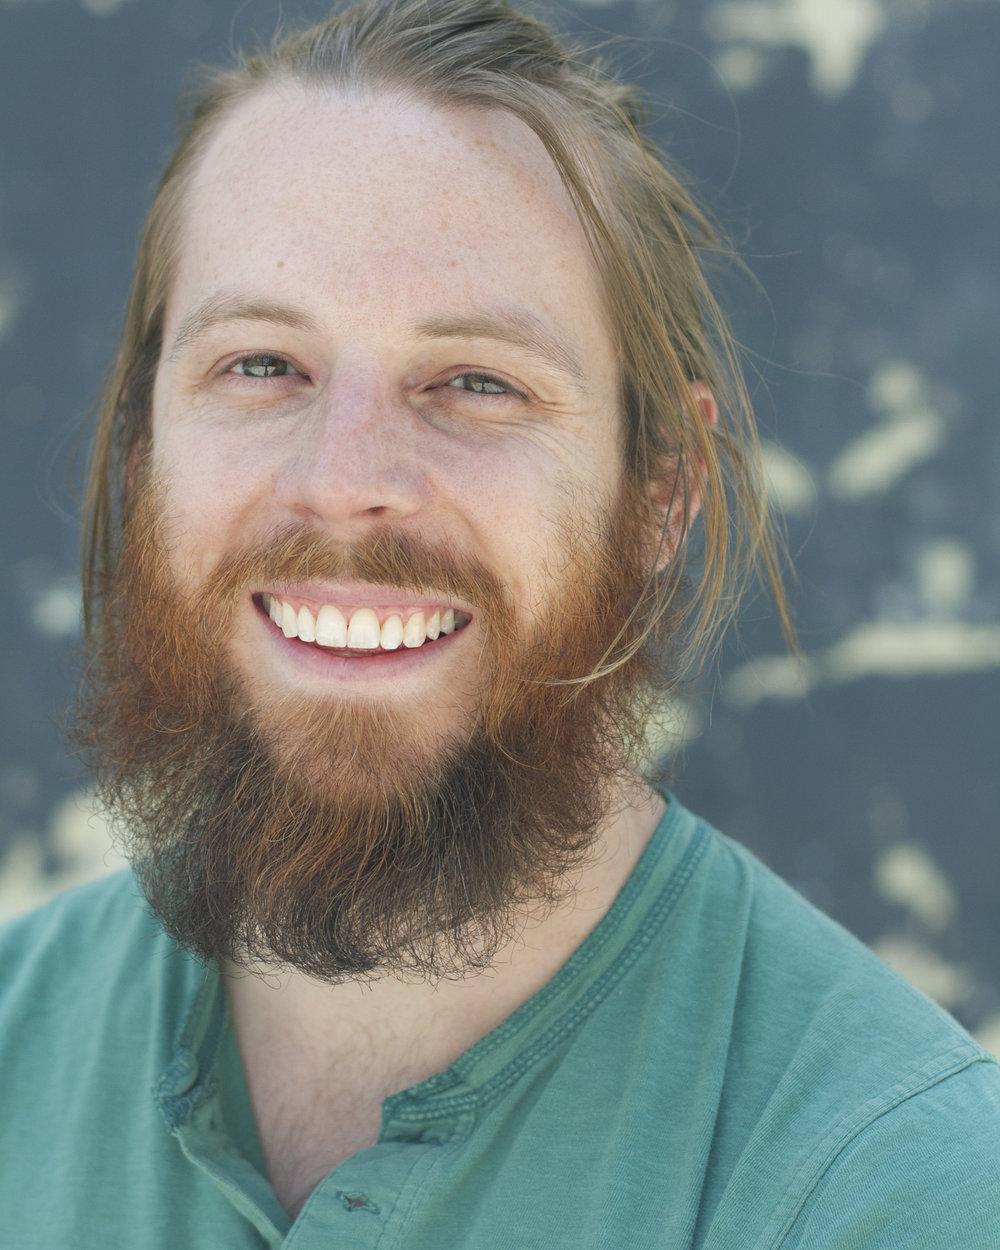 BS Headshot Beard Longhair 2.jpg